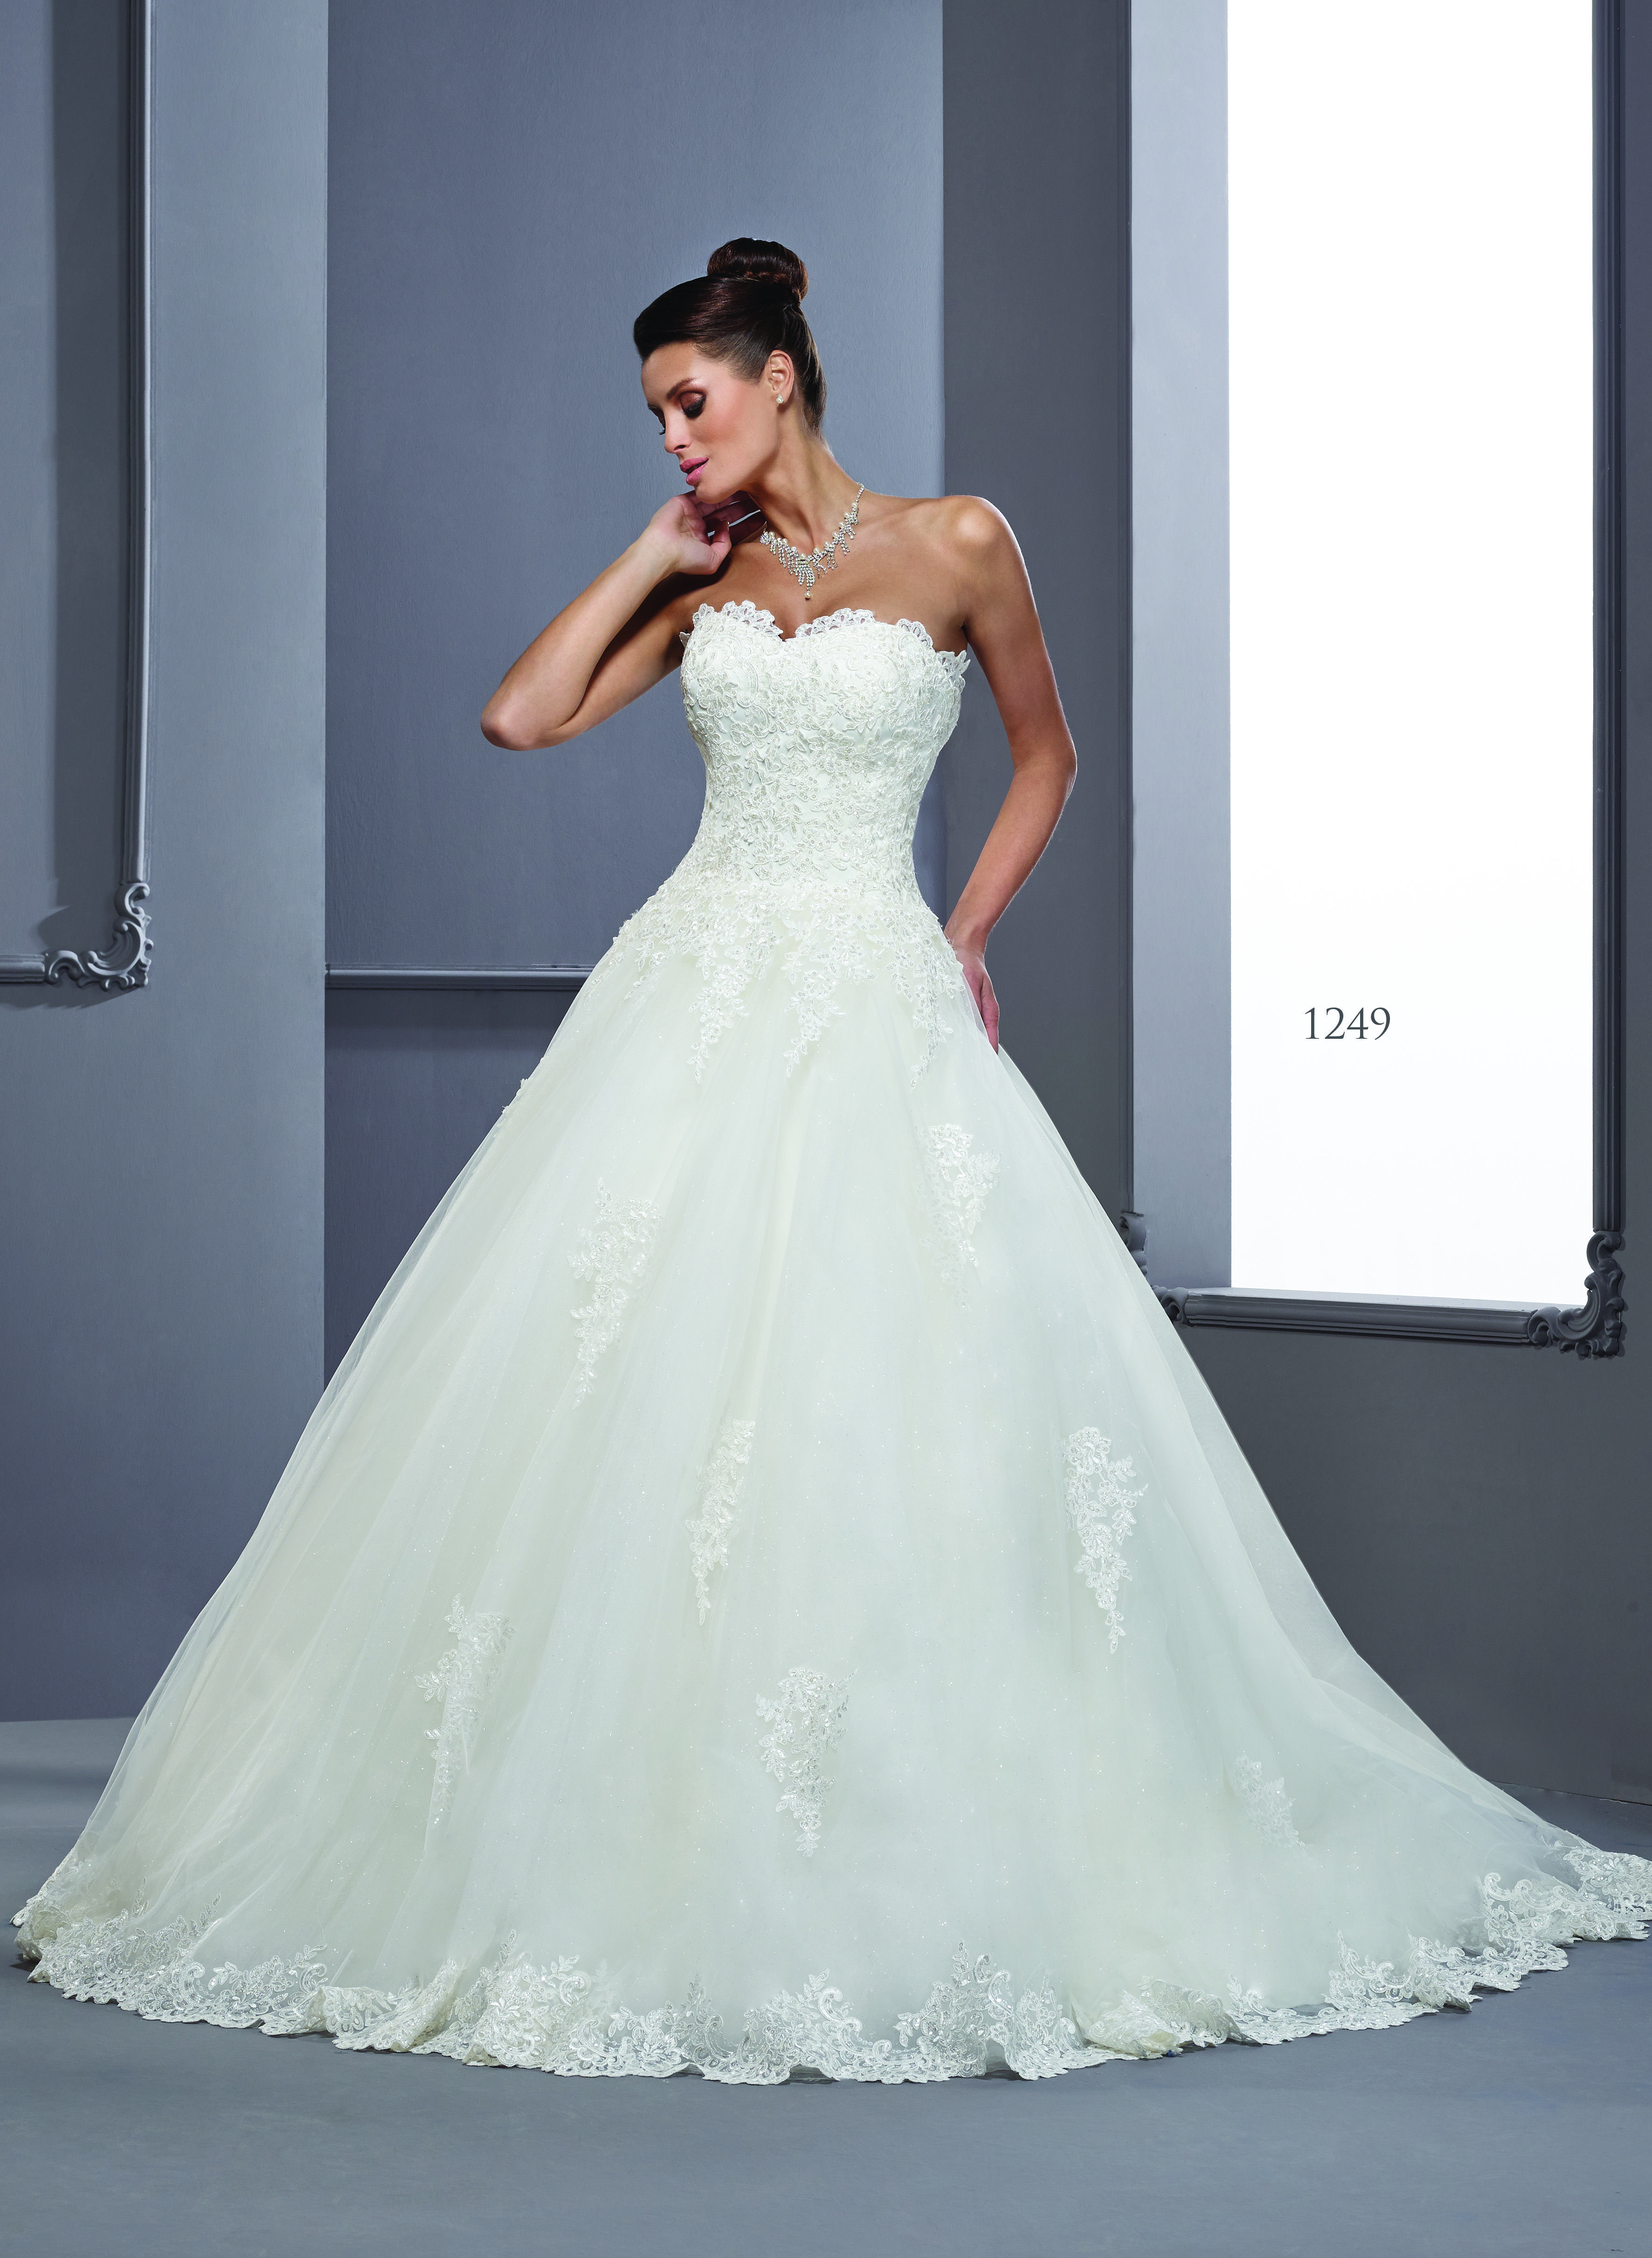 Traditional aline lace wedding gowns darius cordell fashion ltd